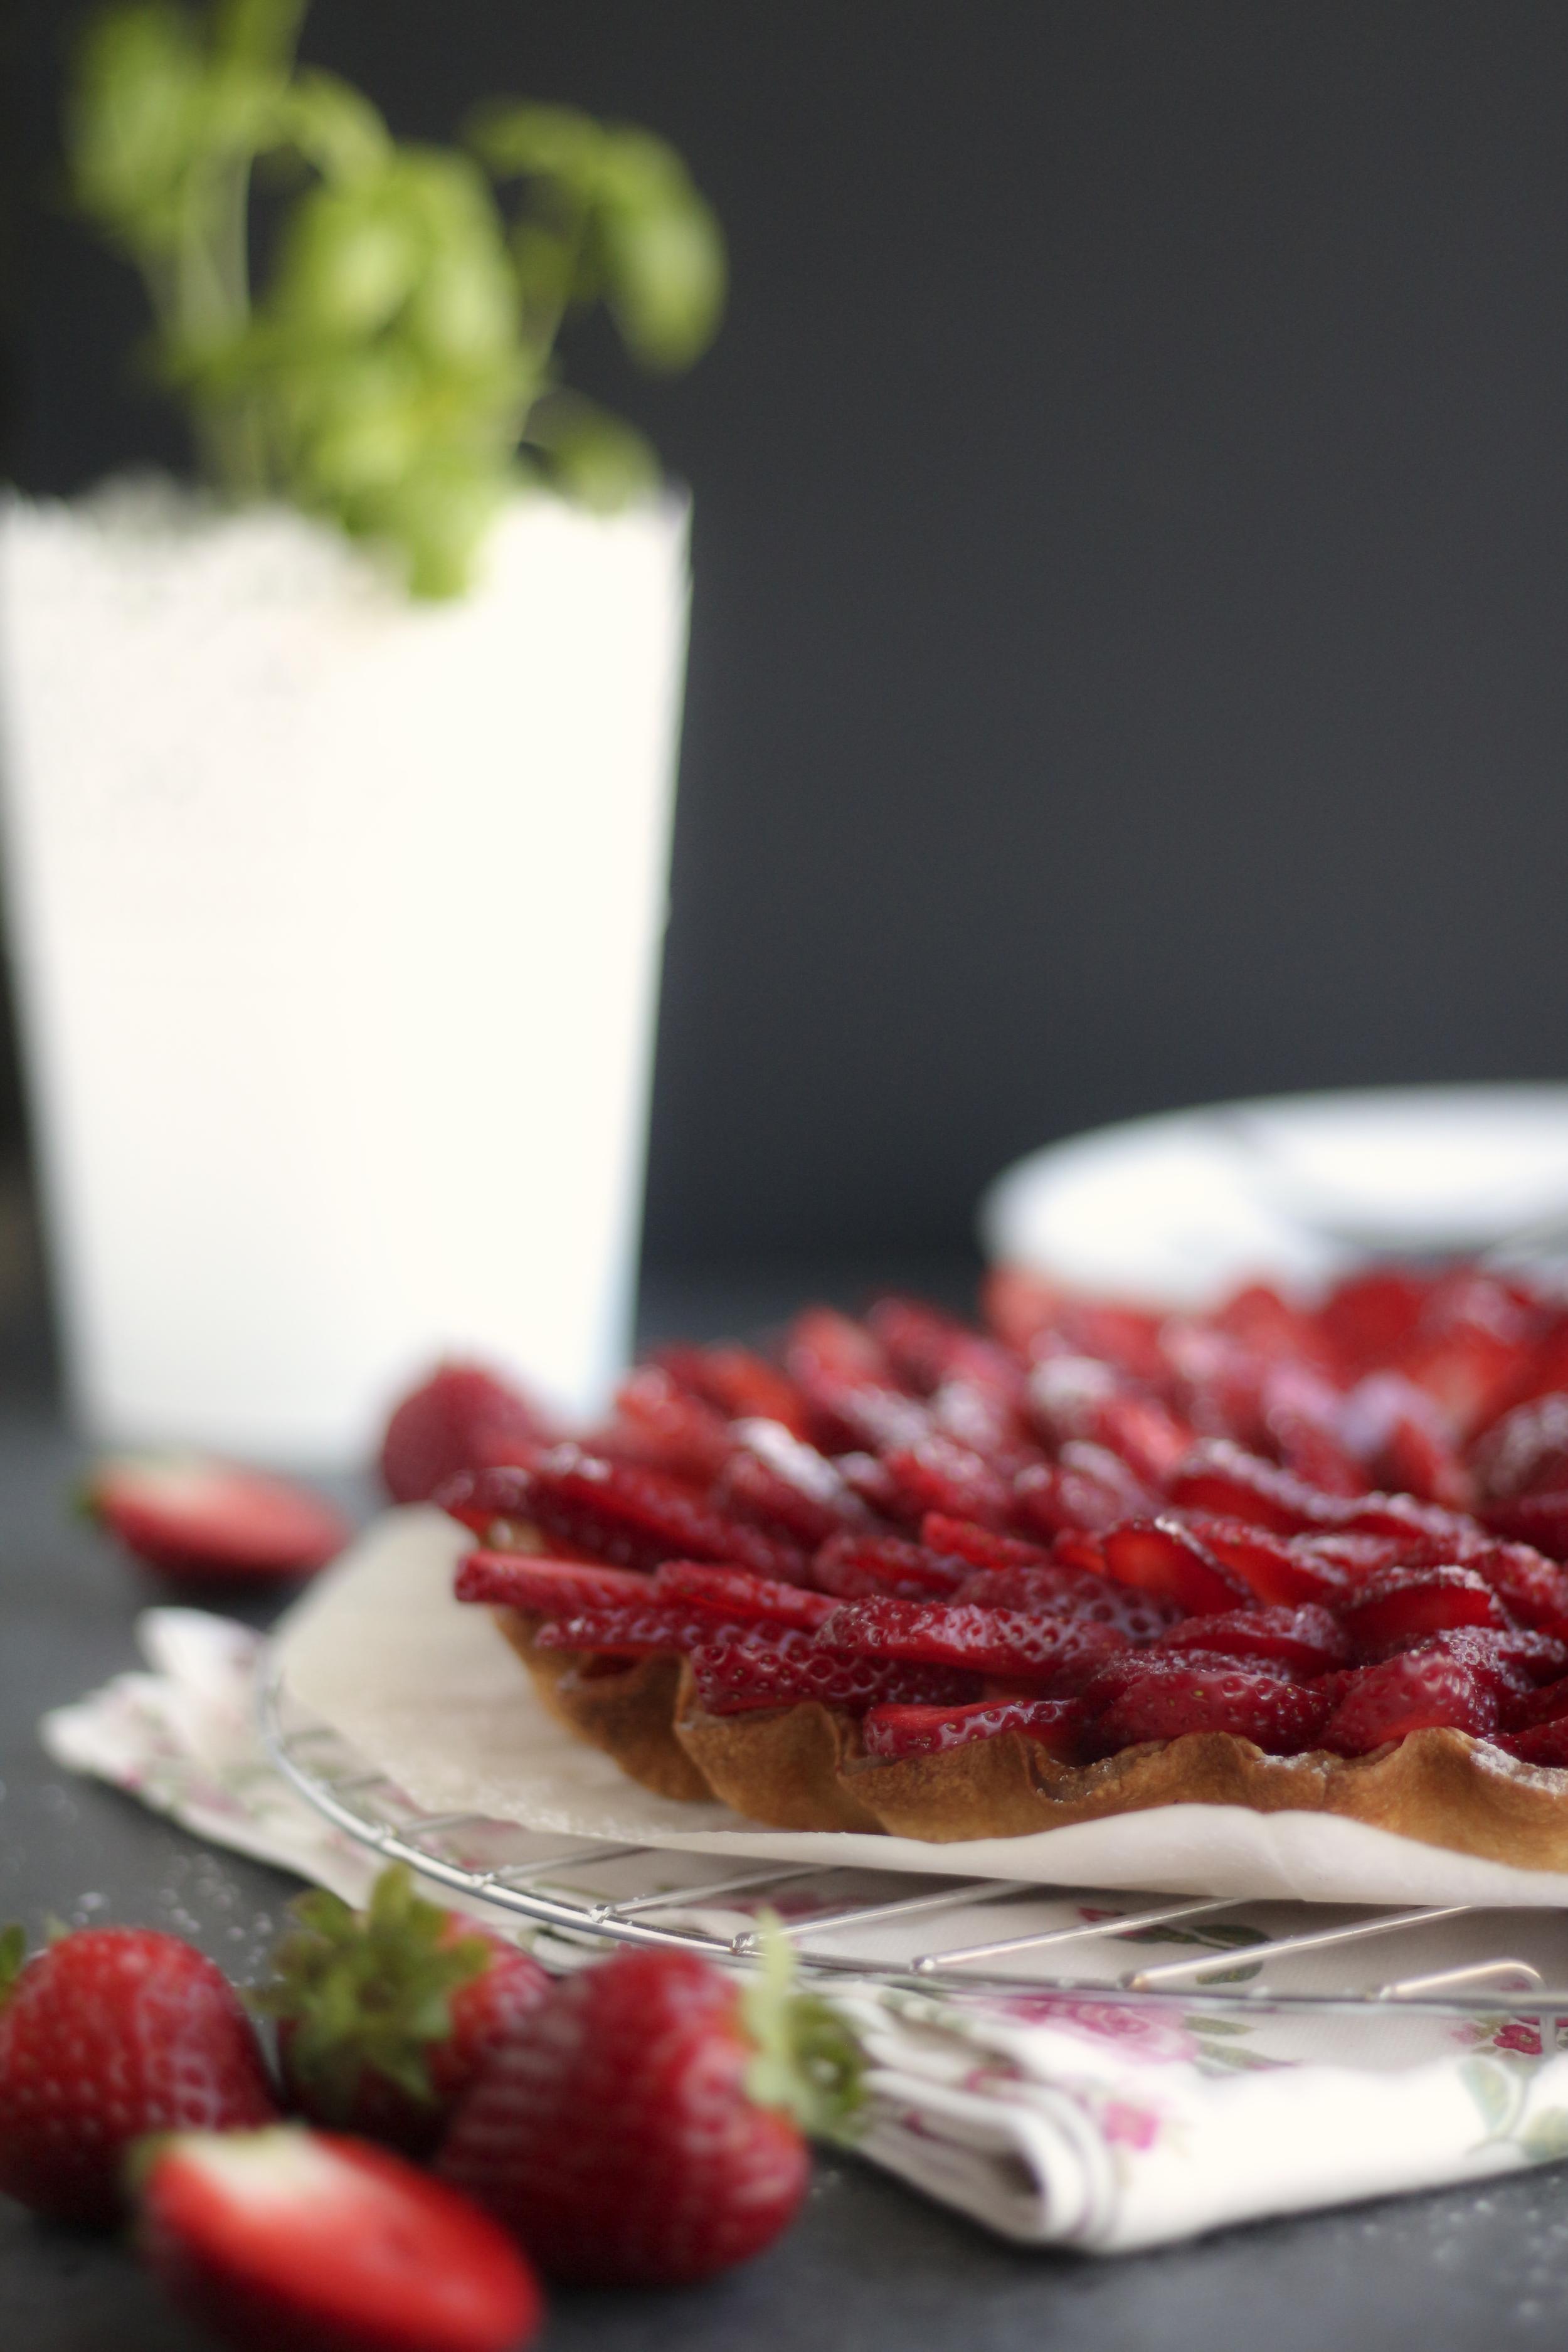 tarte de morangos